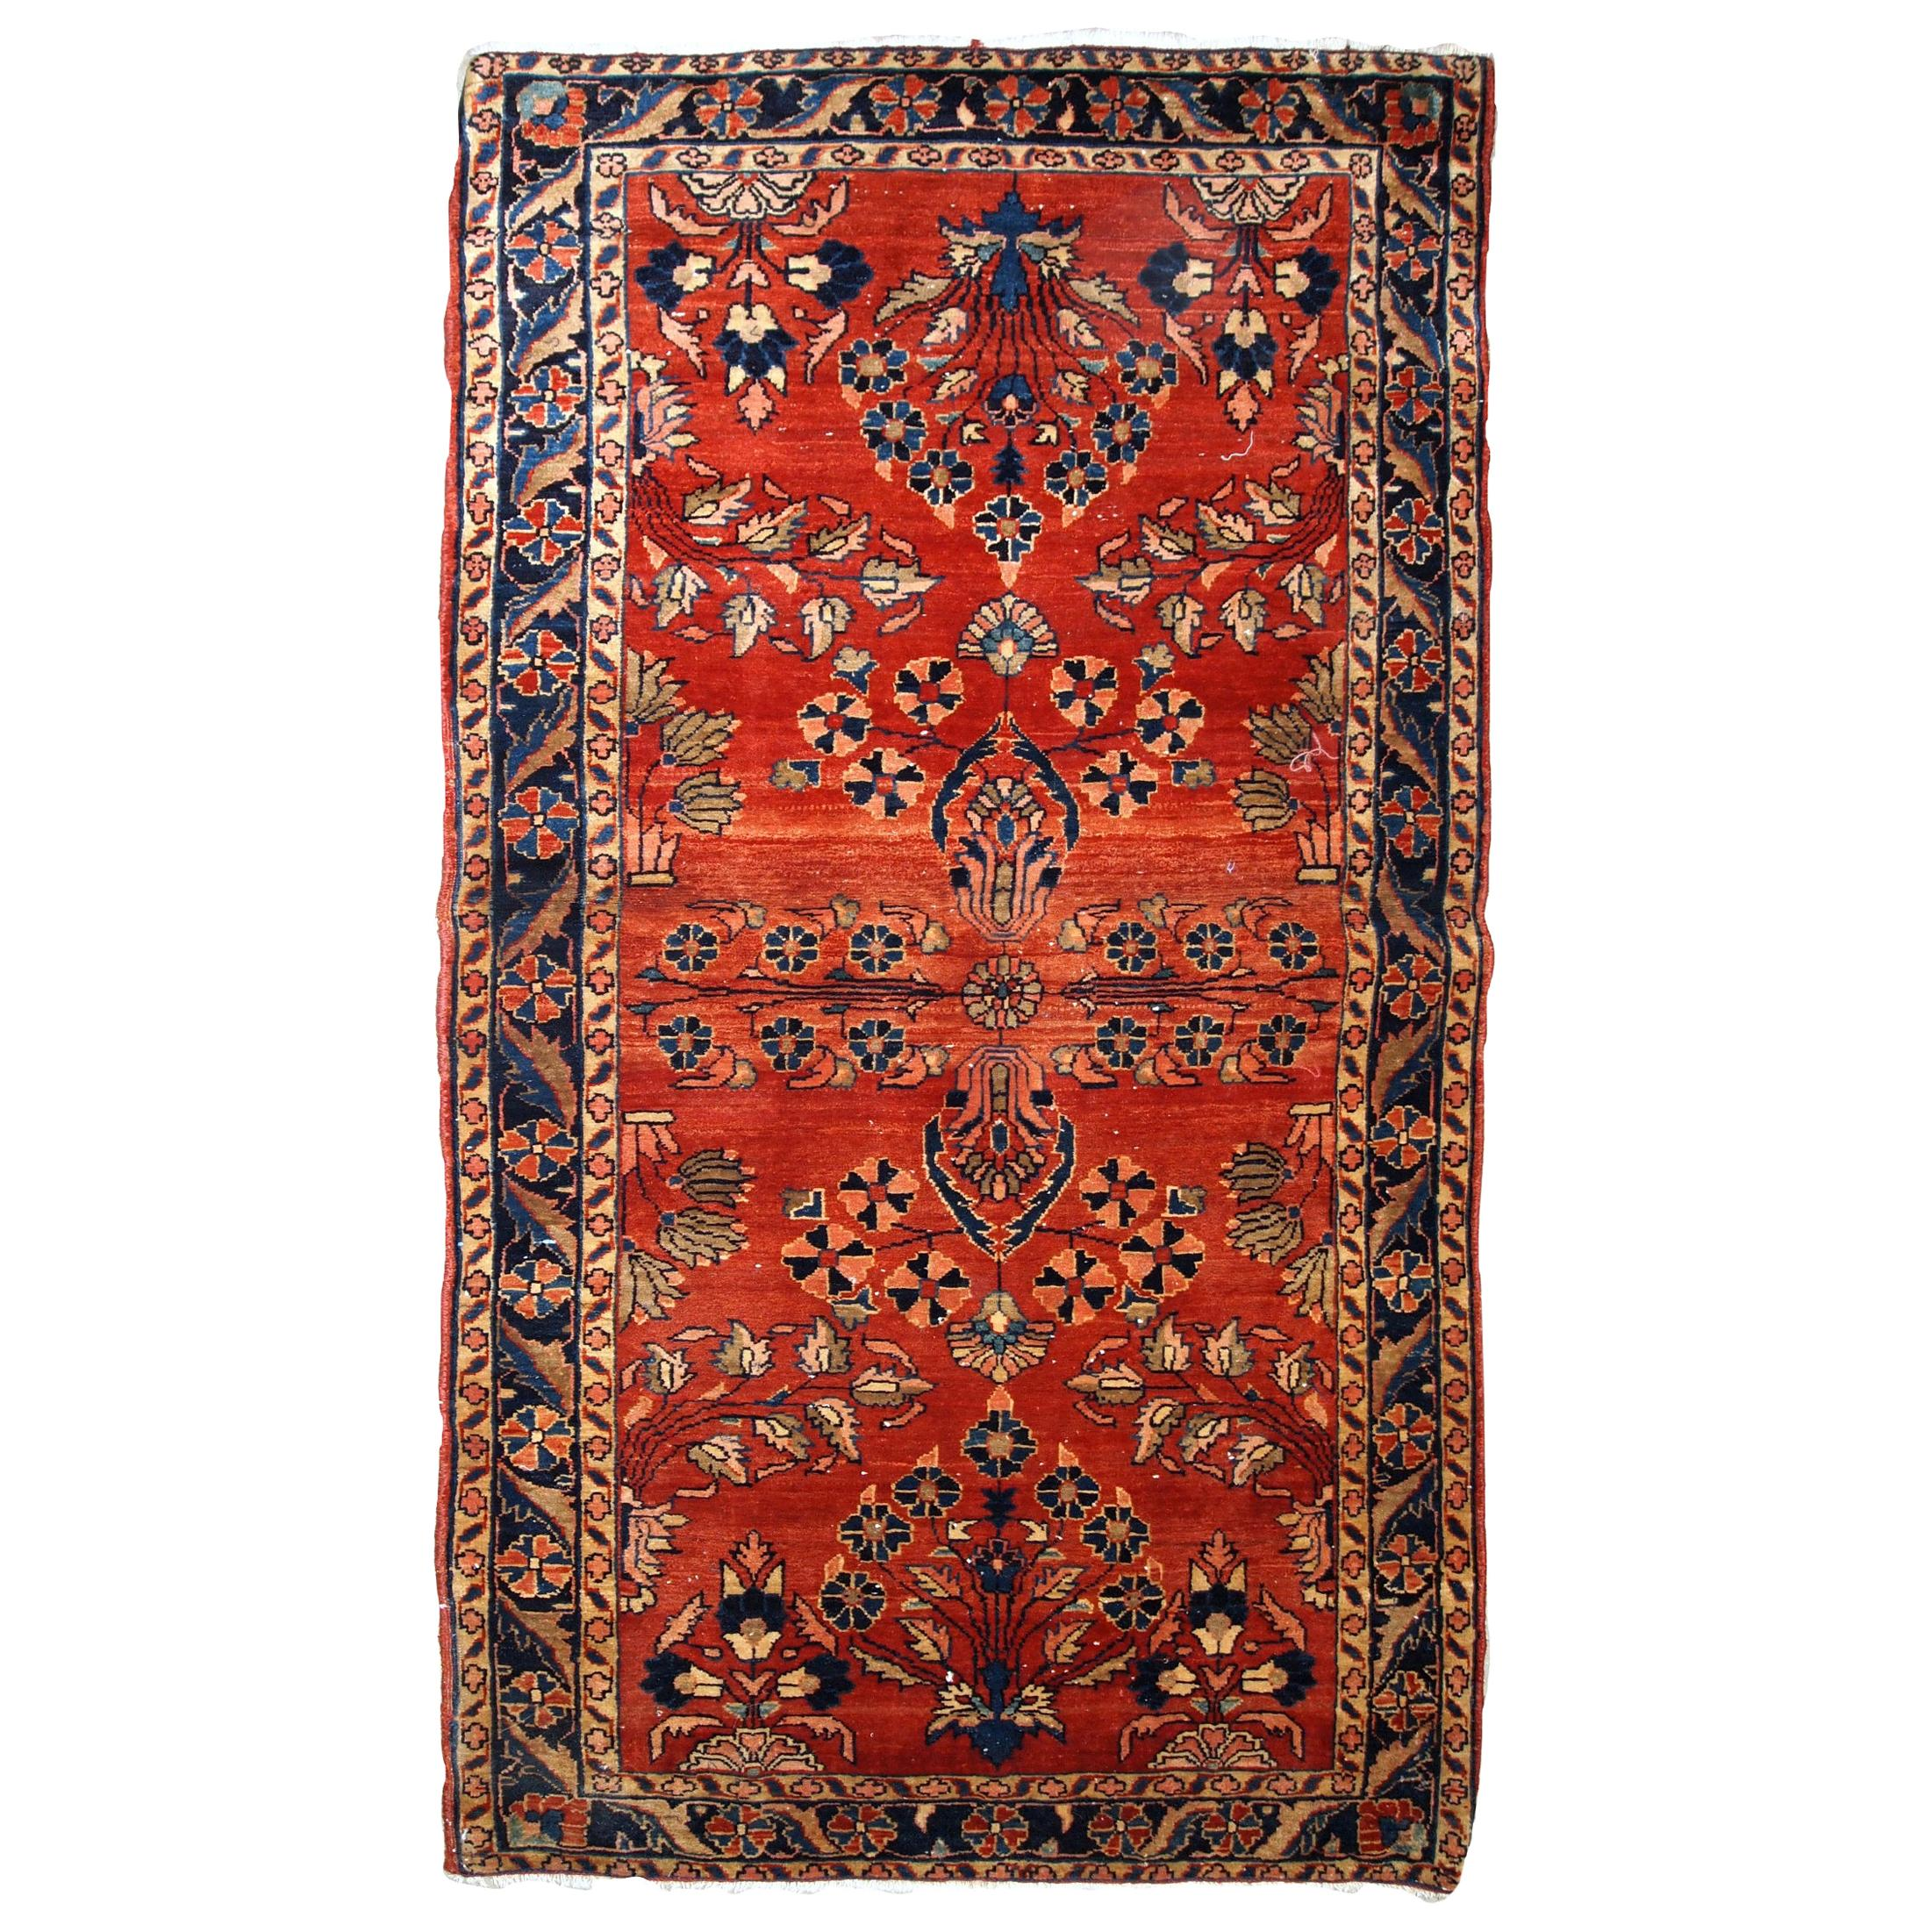 Handmade Antique Sarouk Mahajeran Style Rug, 1900s, 1B838